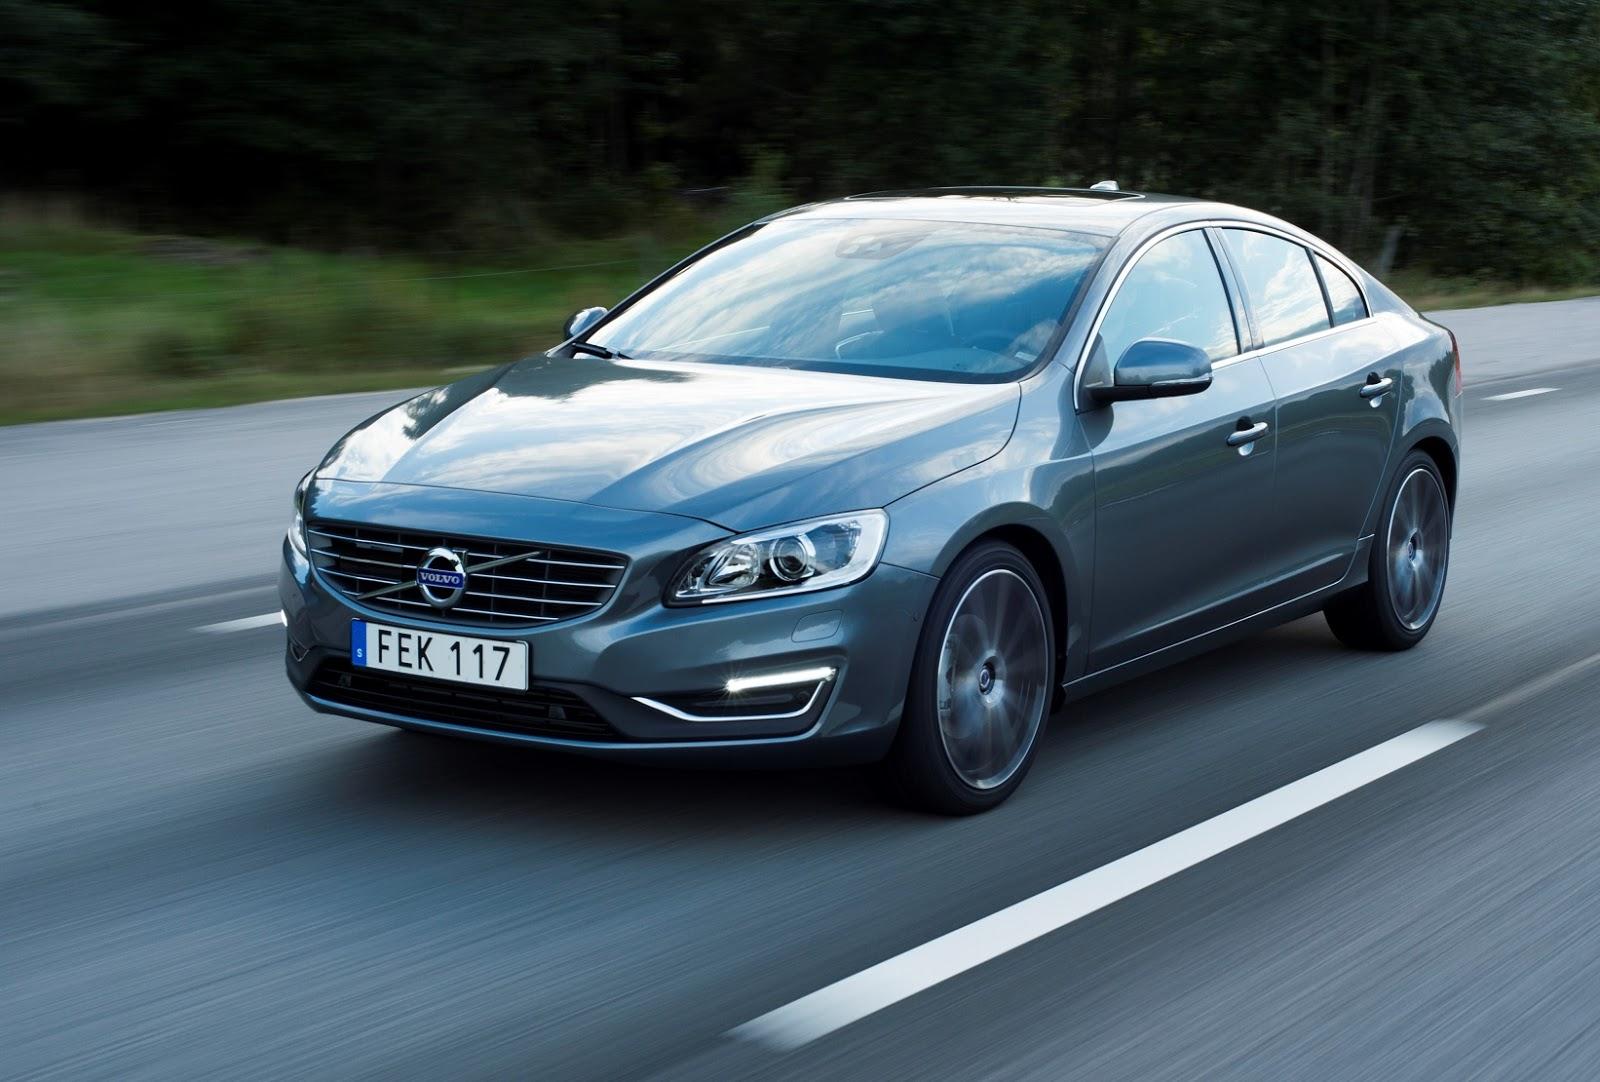 Volvo Now, είναι το ολοκληρωμένο πρόγραμμα από τη Volvo με νέες, σημαντικά μειωμένες τιμές για πολλά μοντέλα της premium εταιρείας